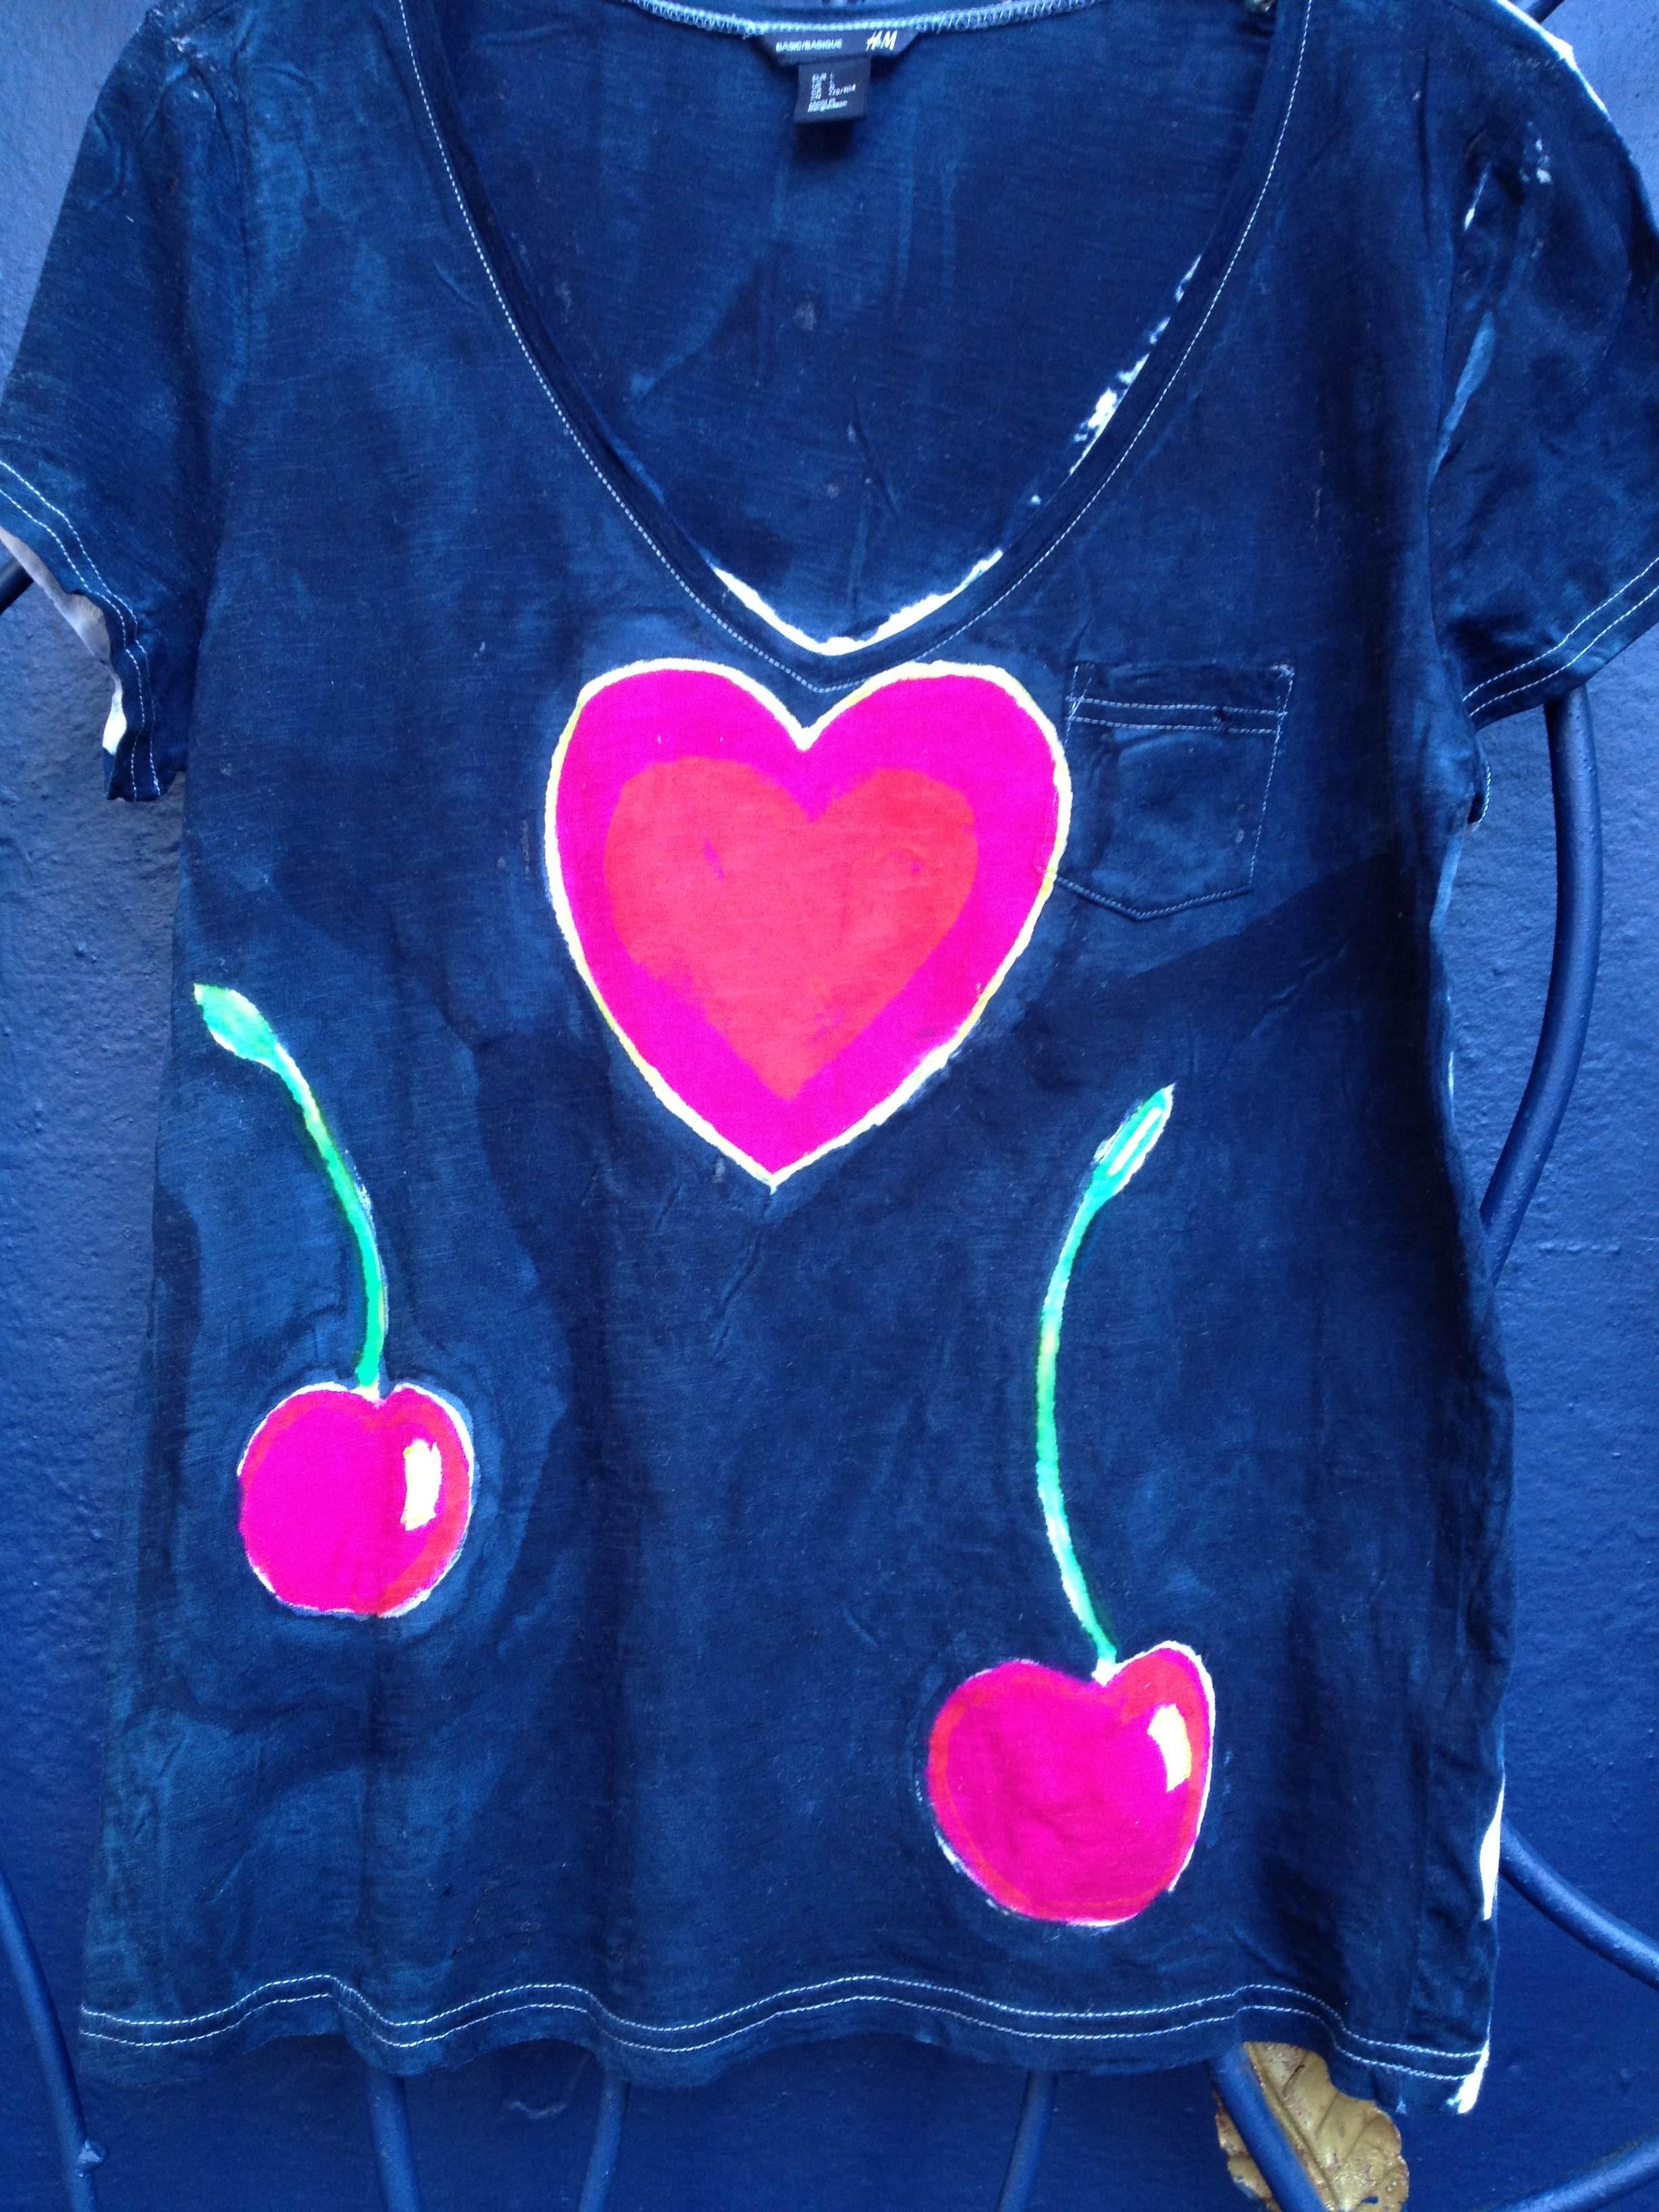 Sleeveless Top - heart cherries magenta by VIDA VIDA Sale Clearance Clearance Buy bATkE5